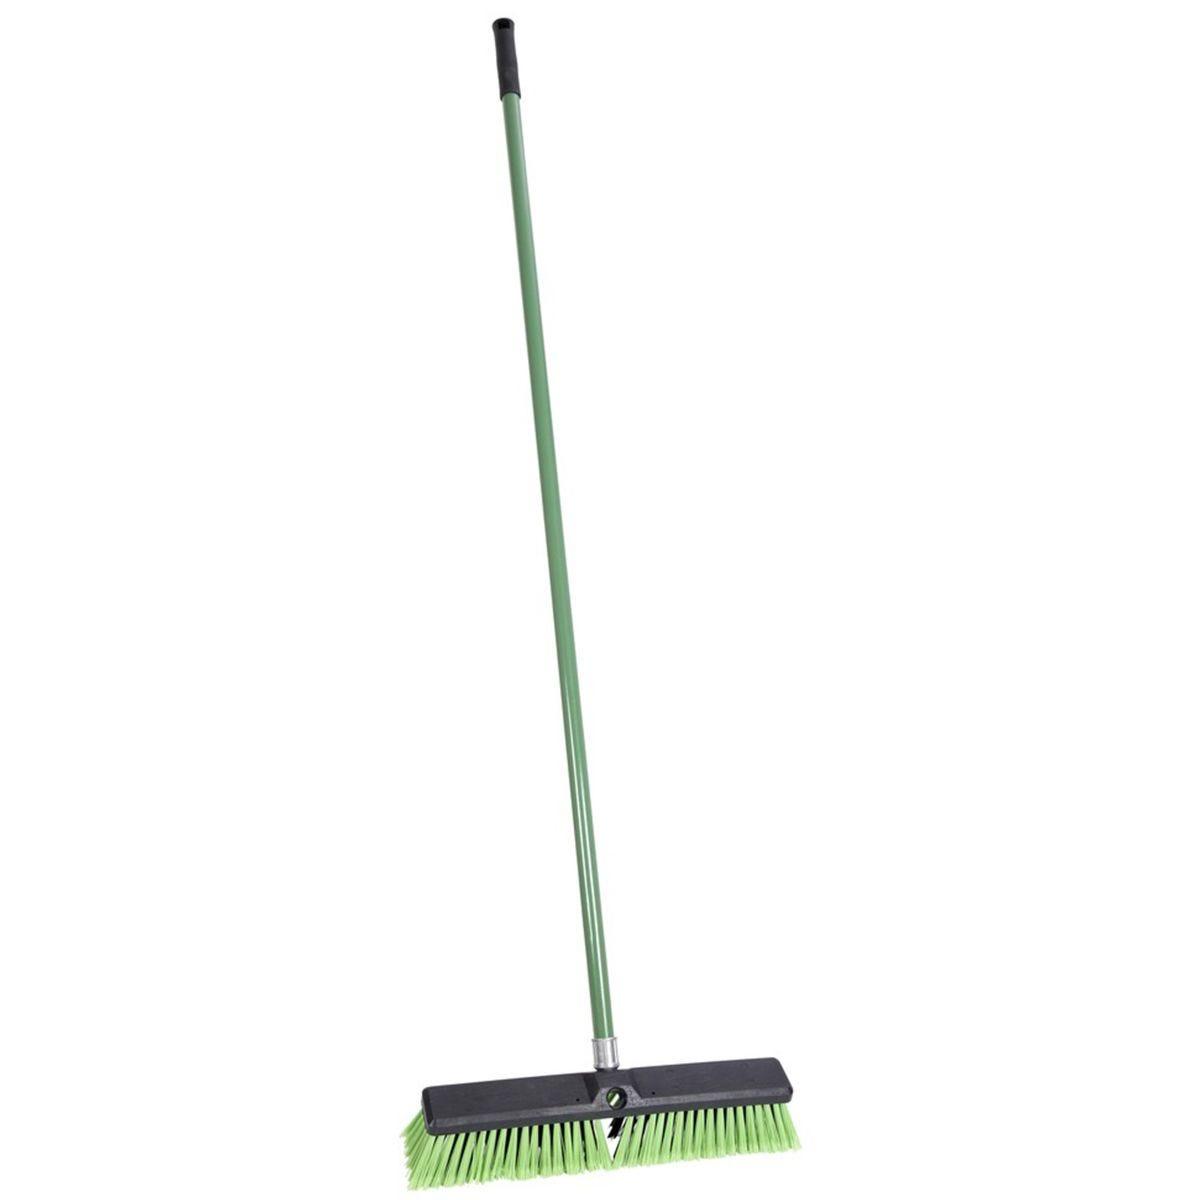 JVL Heavy Duty Outdoor Yard Sweeping Brush